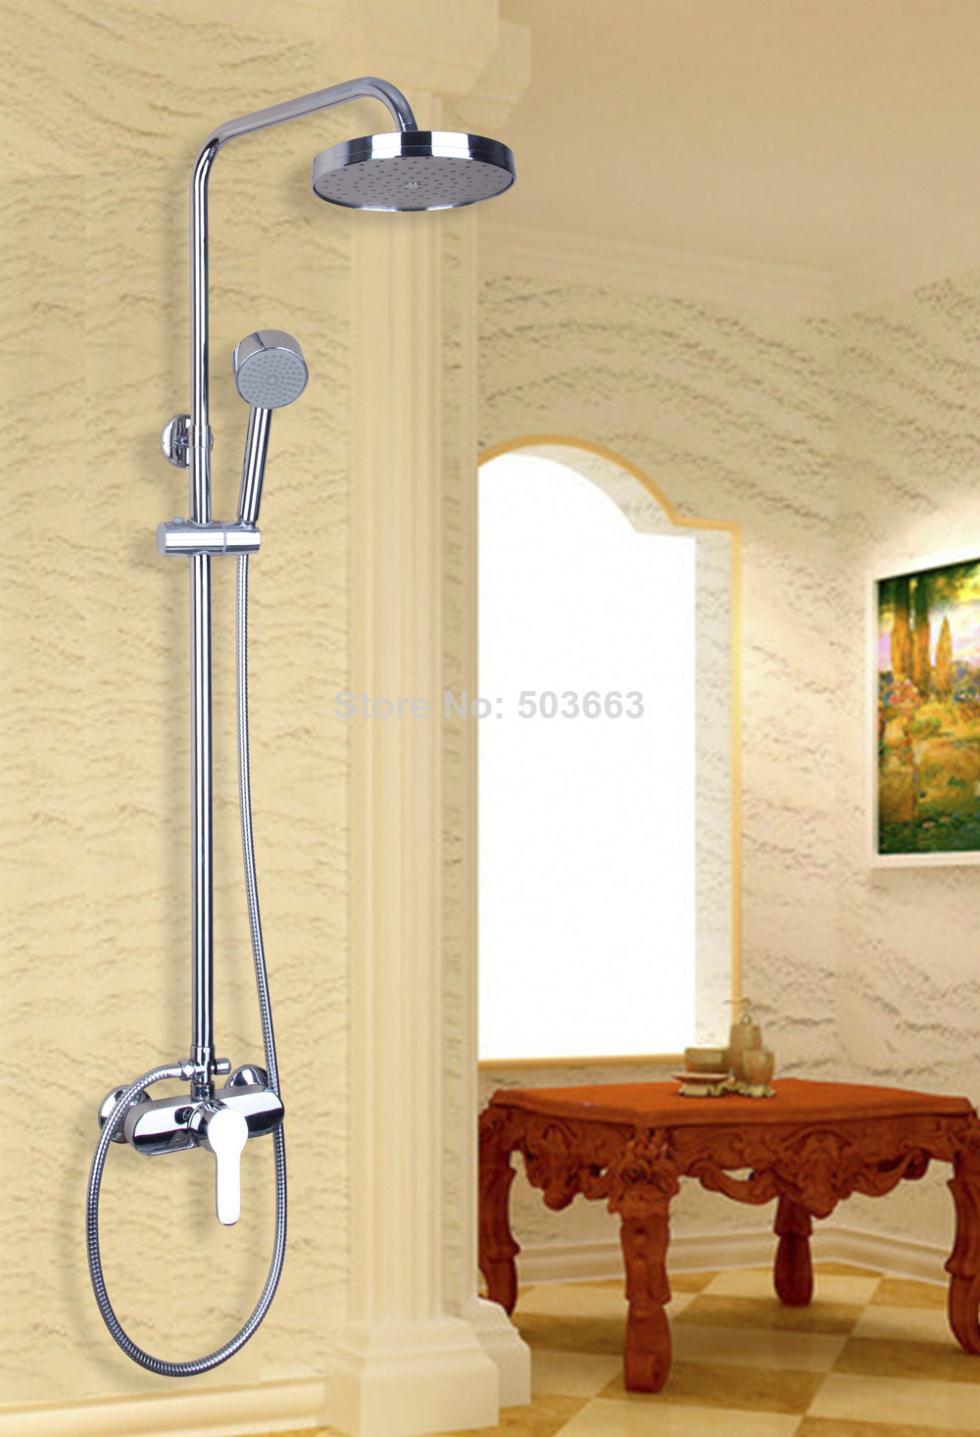 Torayvino 53601 Bath 8 Round Rain Showe Head Hand Shower Set Wall Mount Chrome